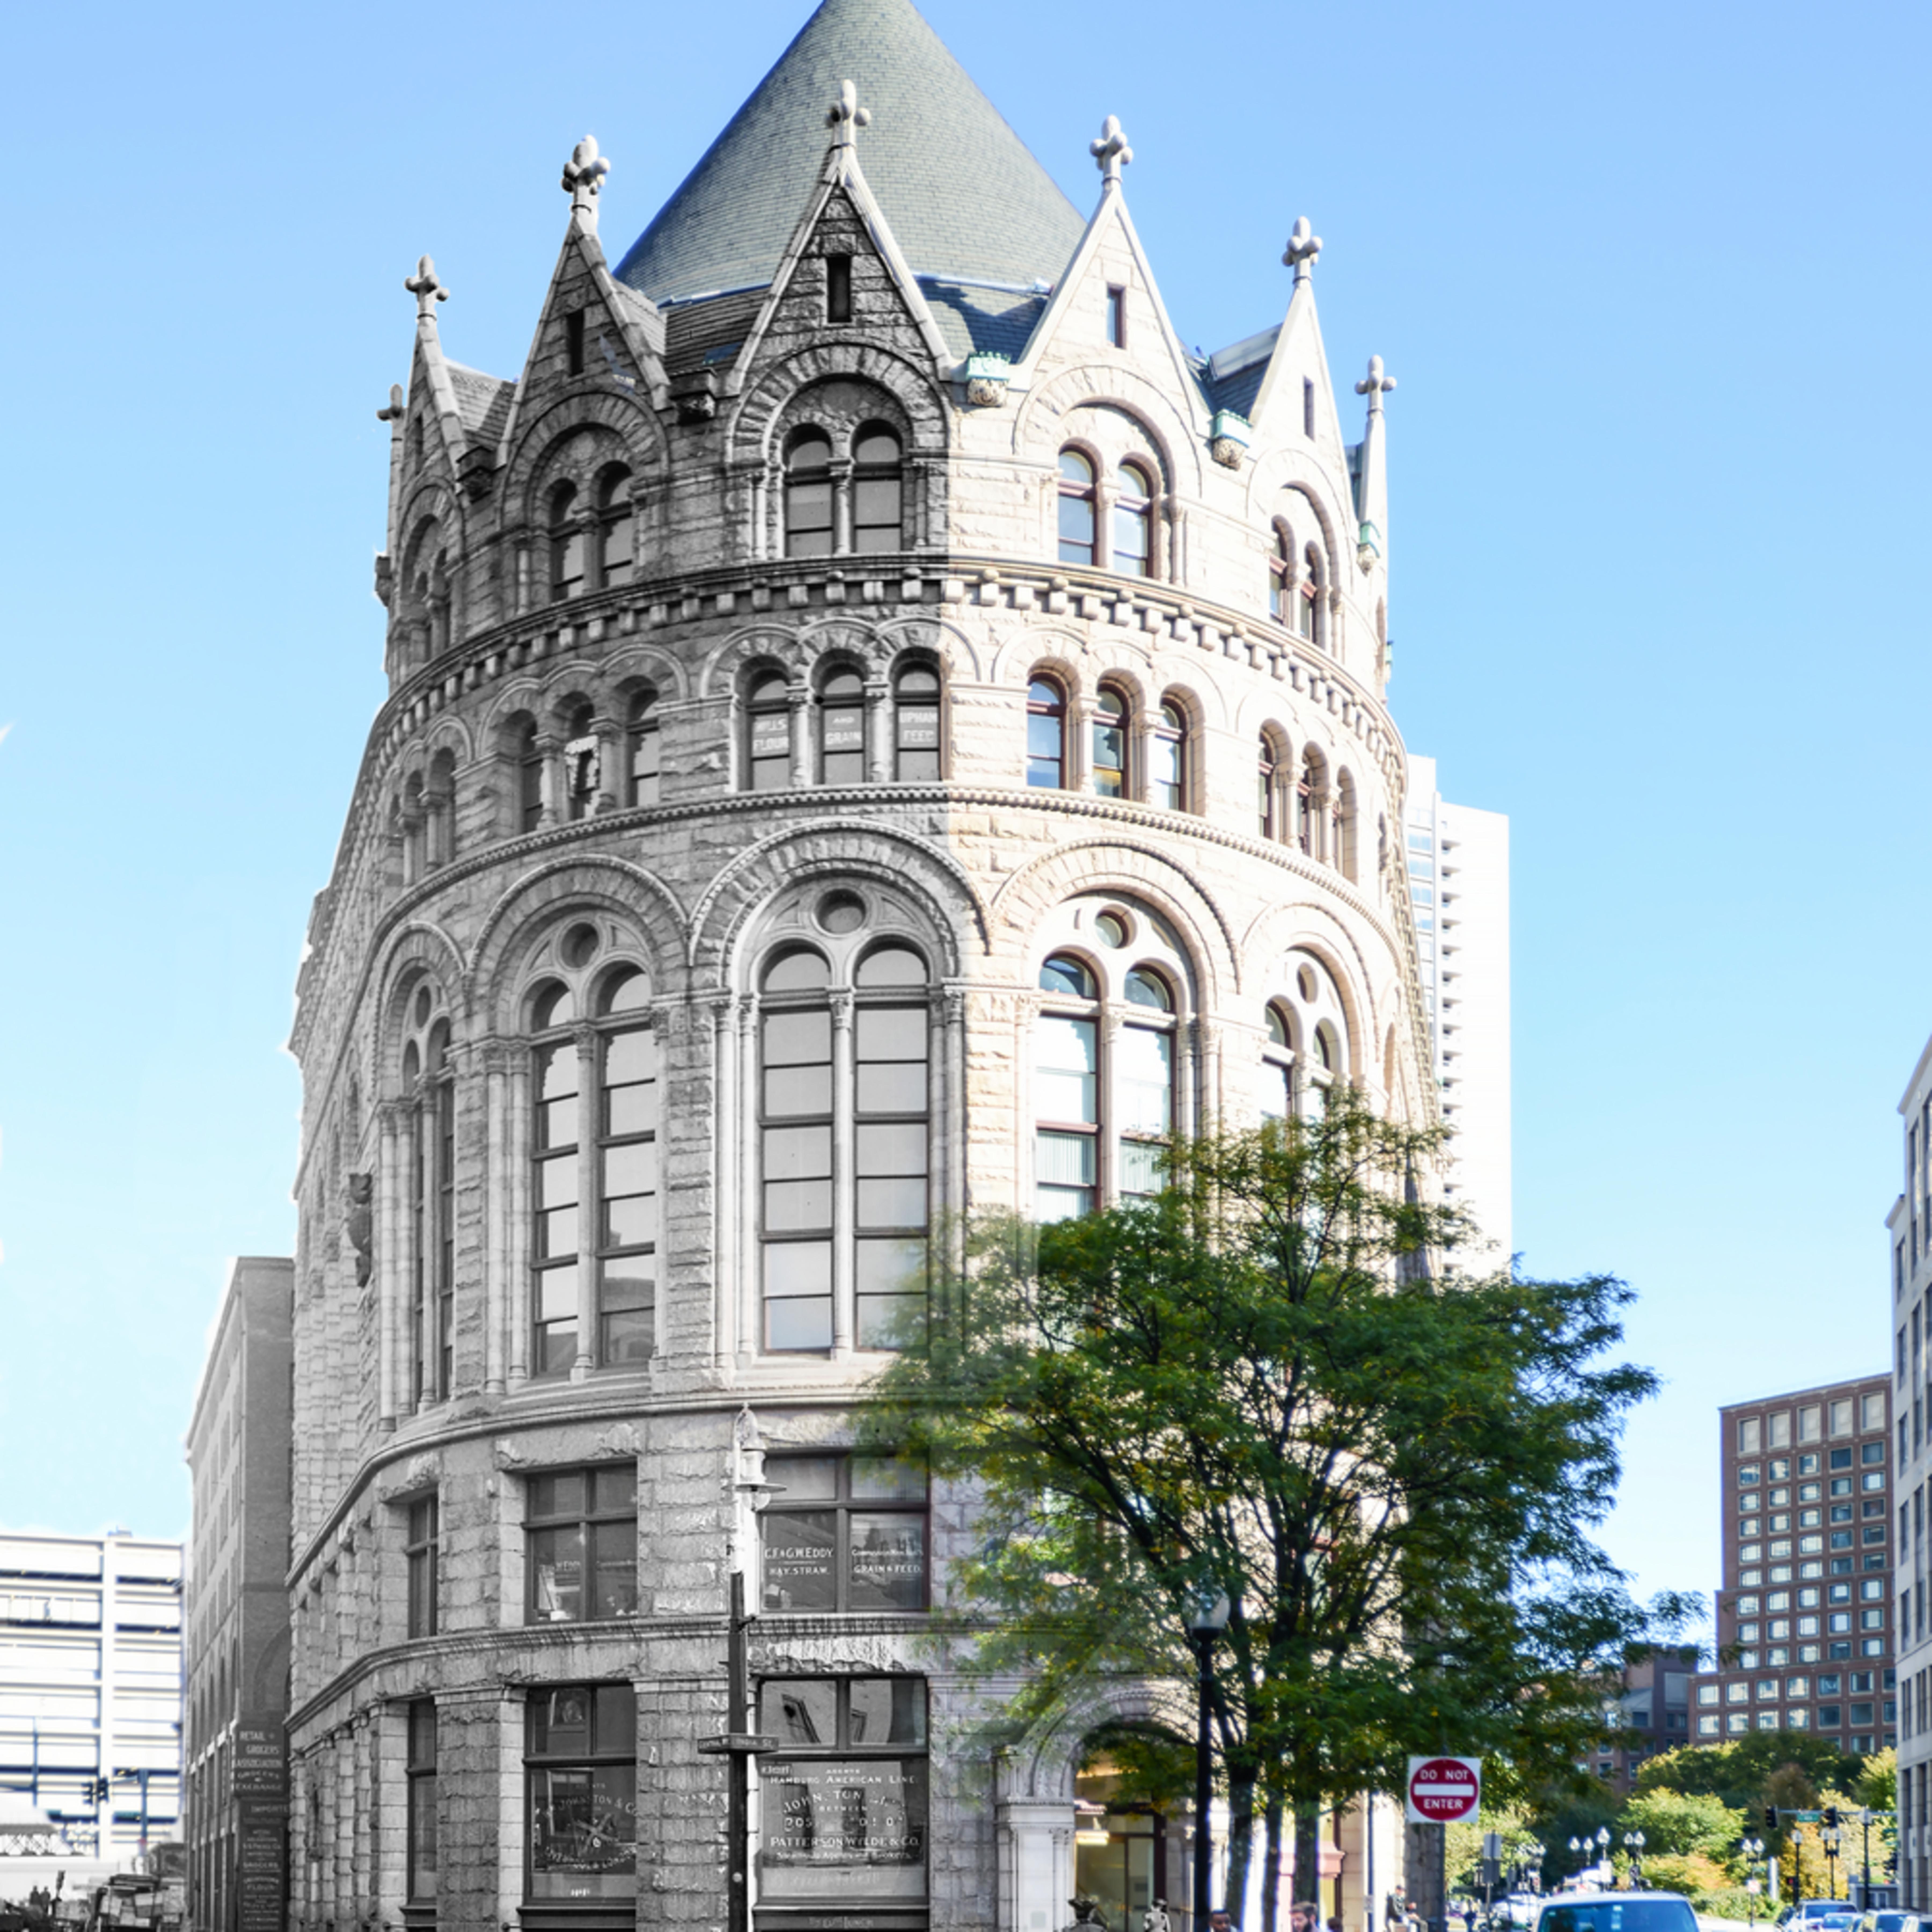 Dsc 8830 chamber of commerce boston mass. 24x30 httxnc